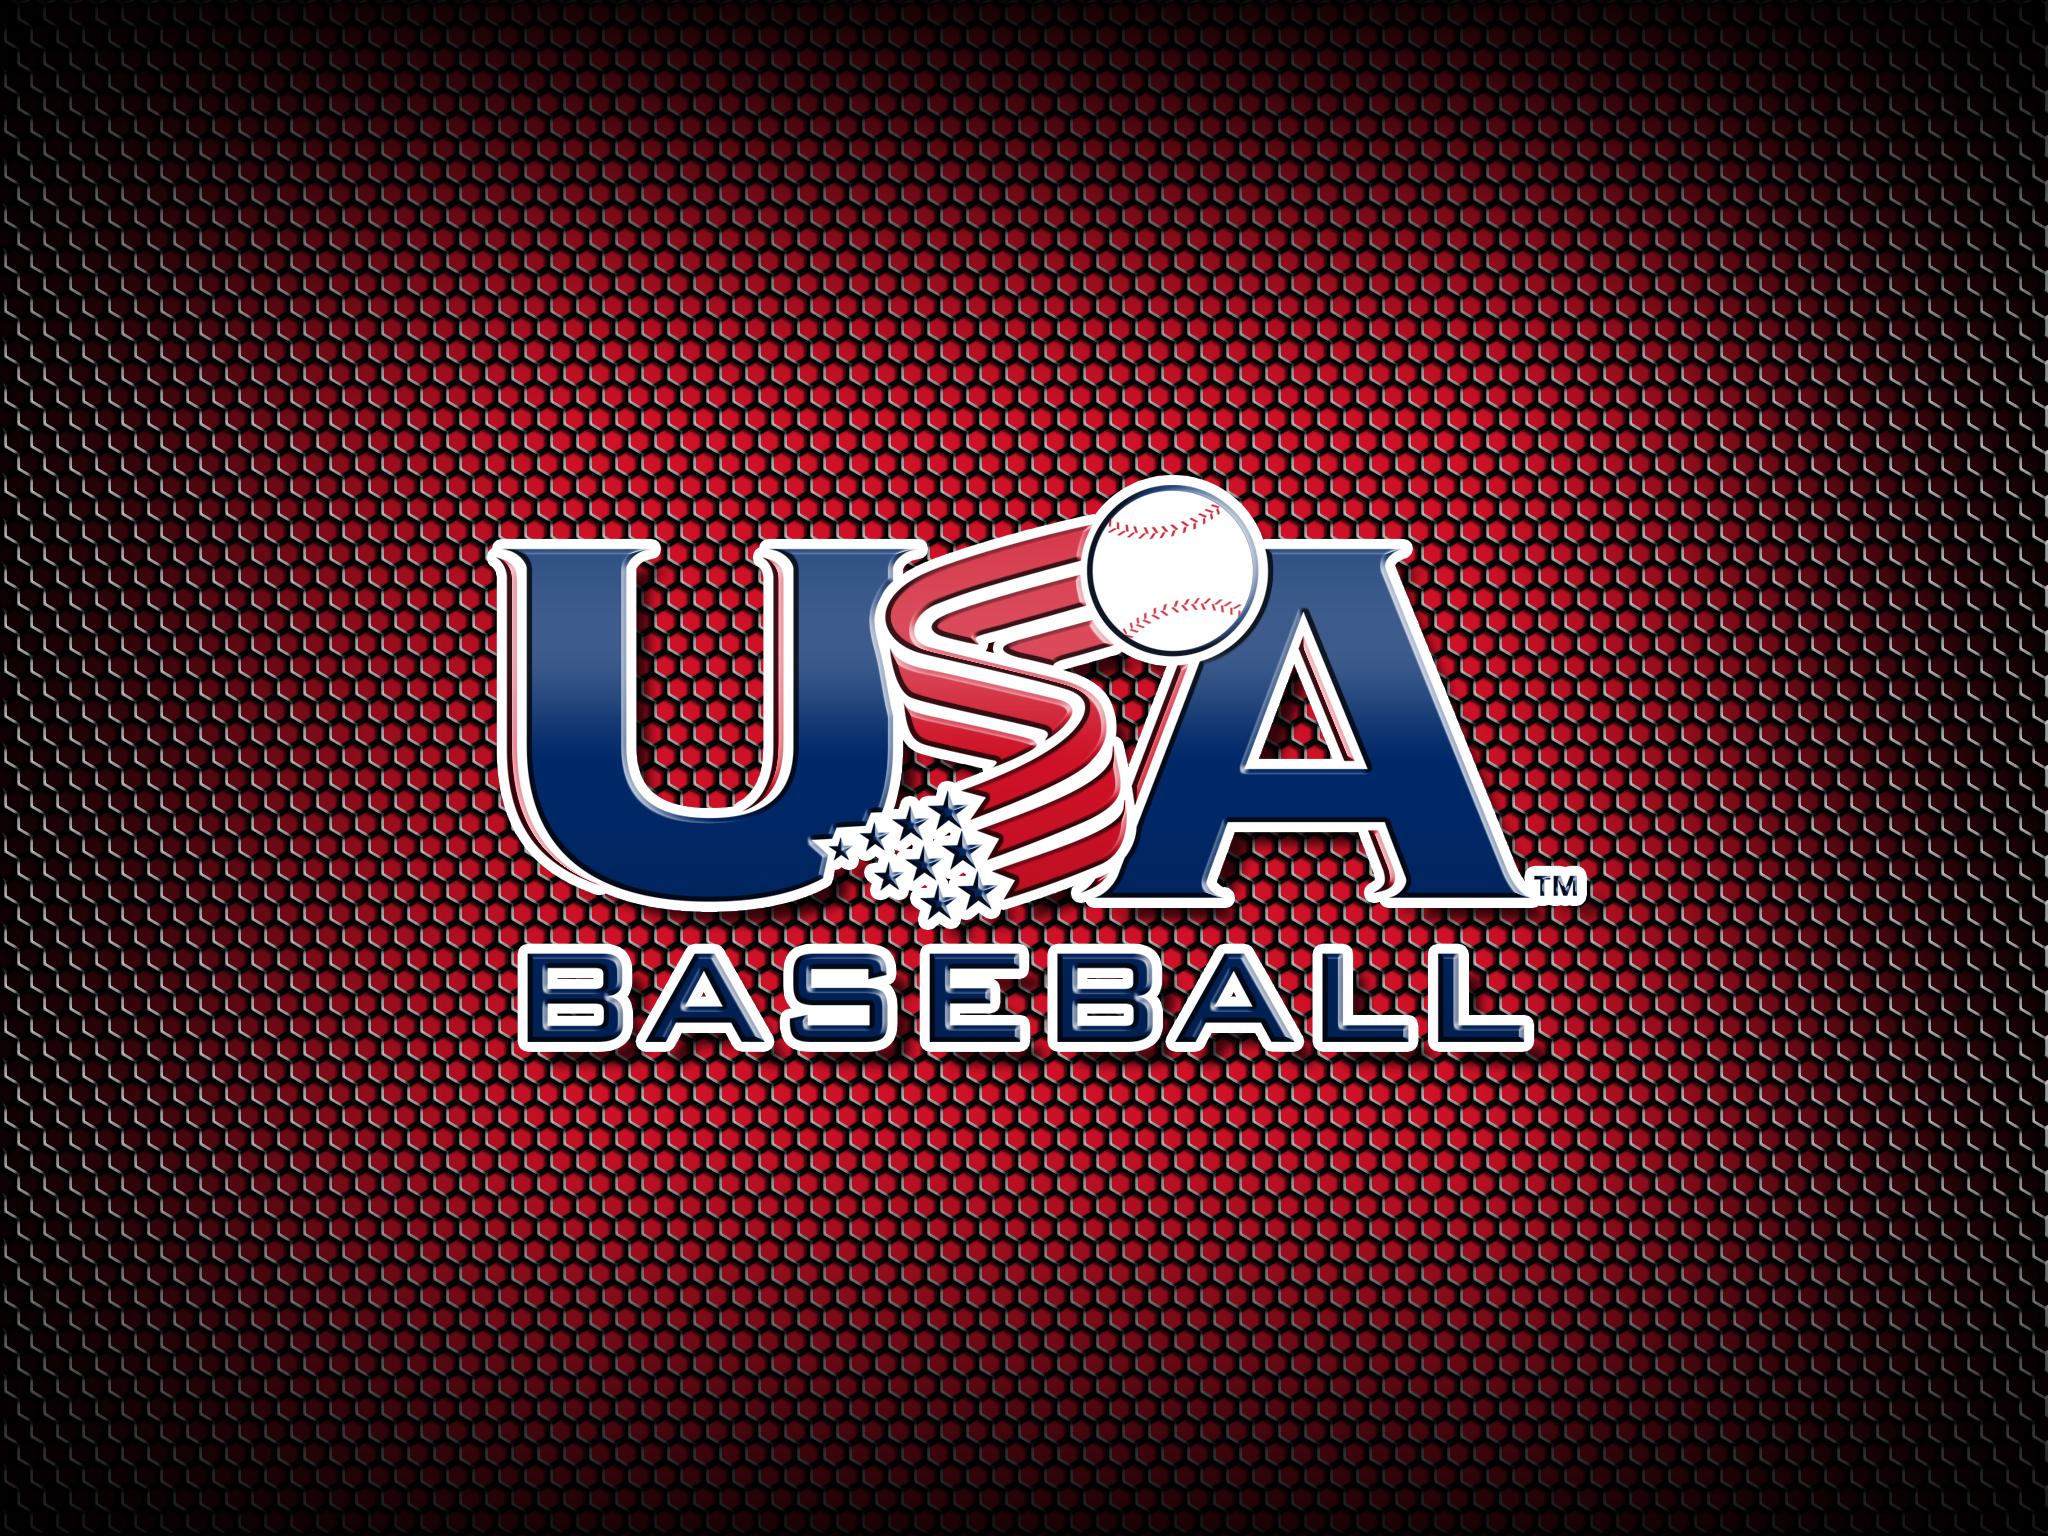 USABaseballcom The official site of USA Baseball 2048x1536